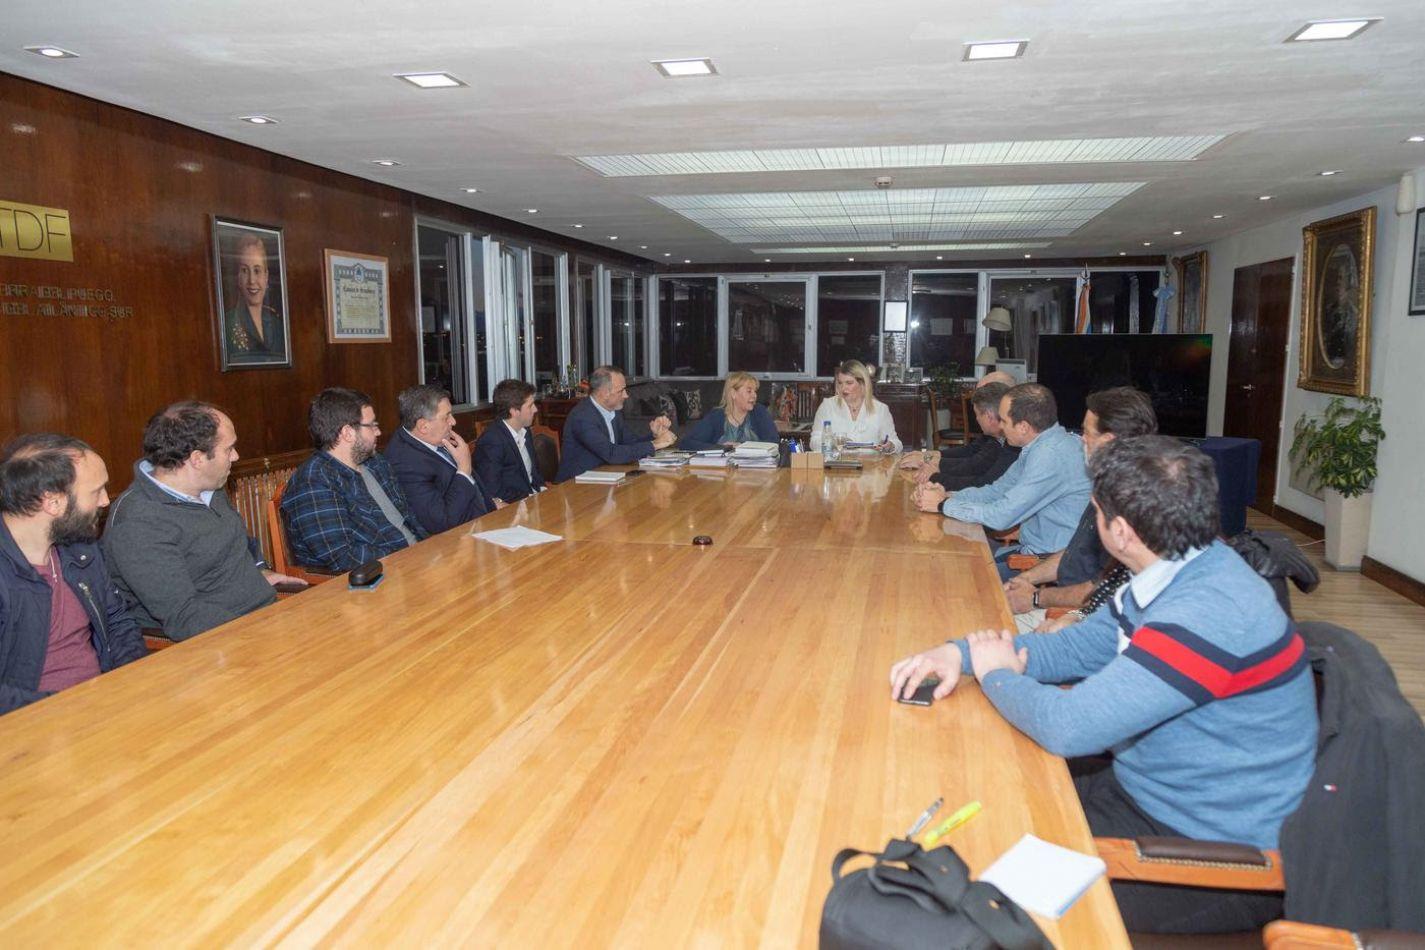 Reunión con la Cámar de Comercio  de Ushuaia